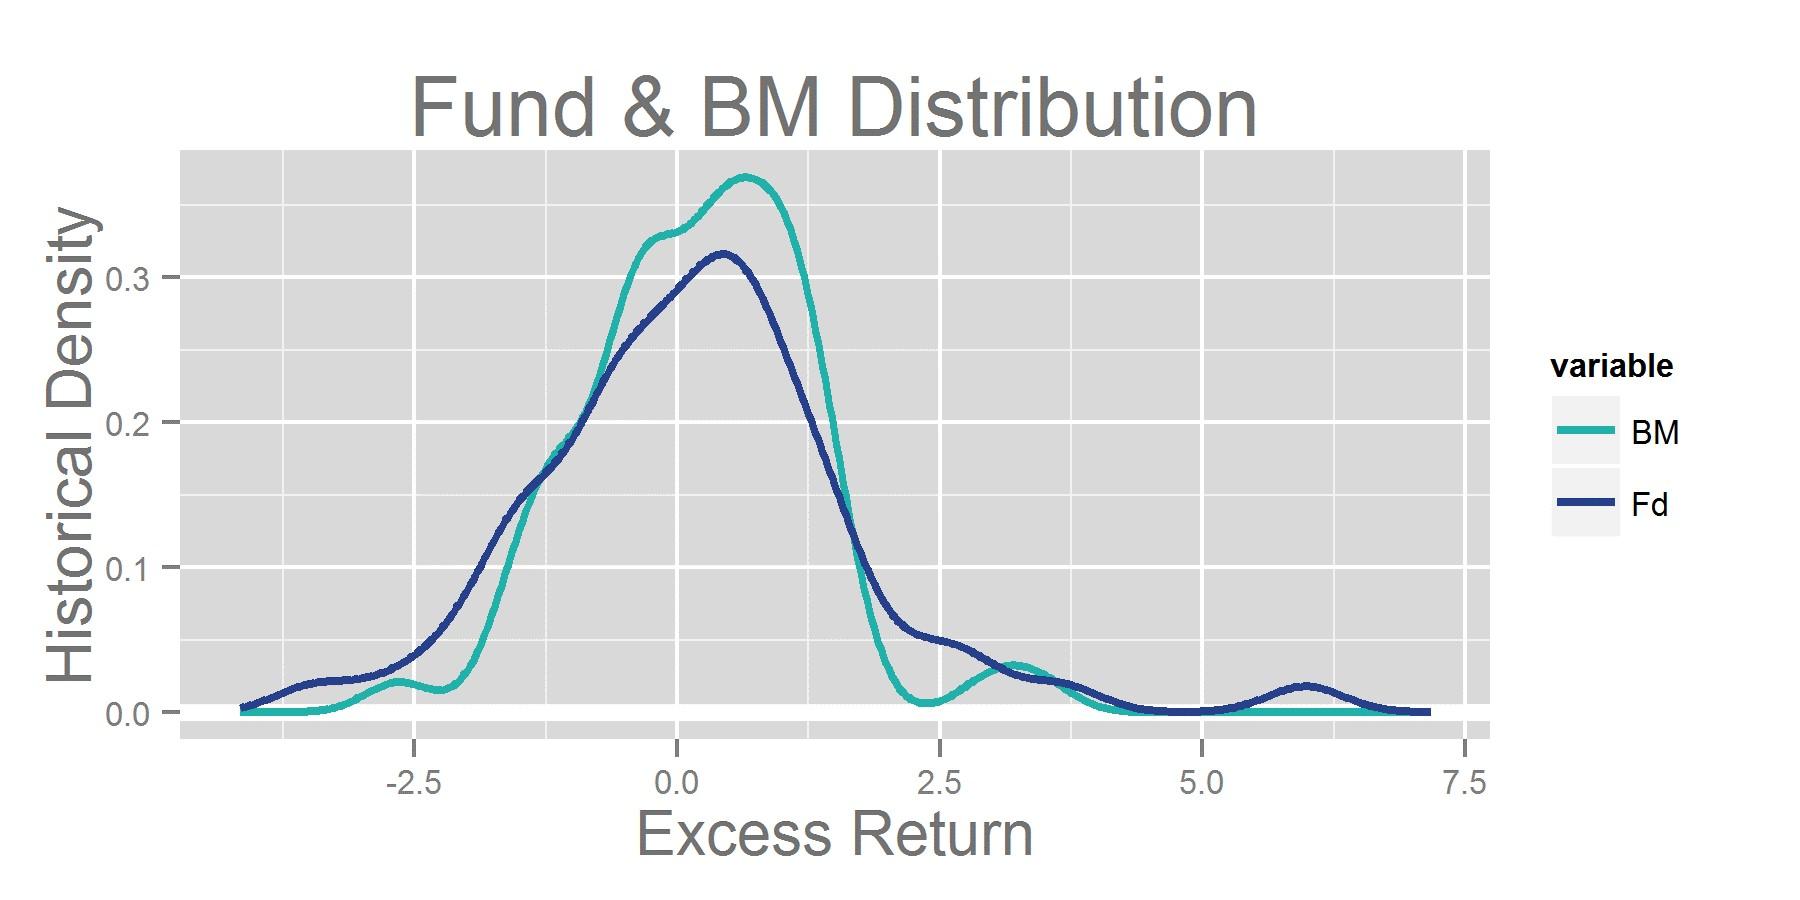 Fund & BM Distribution